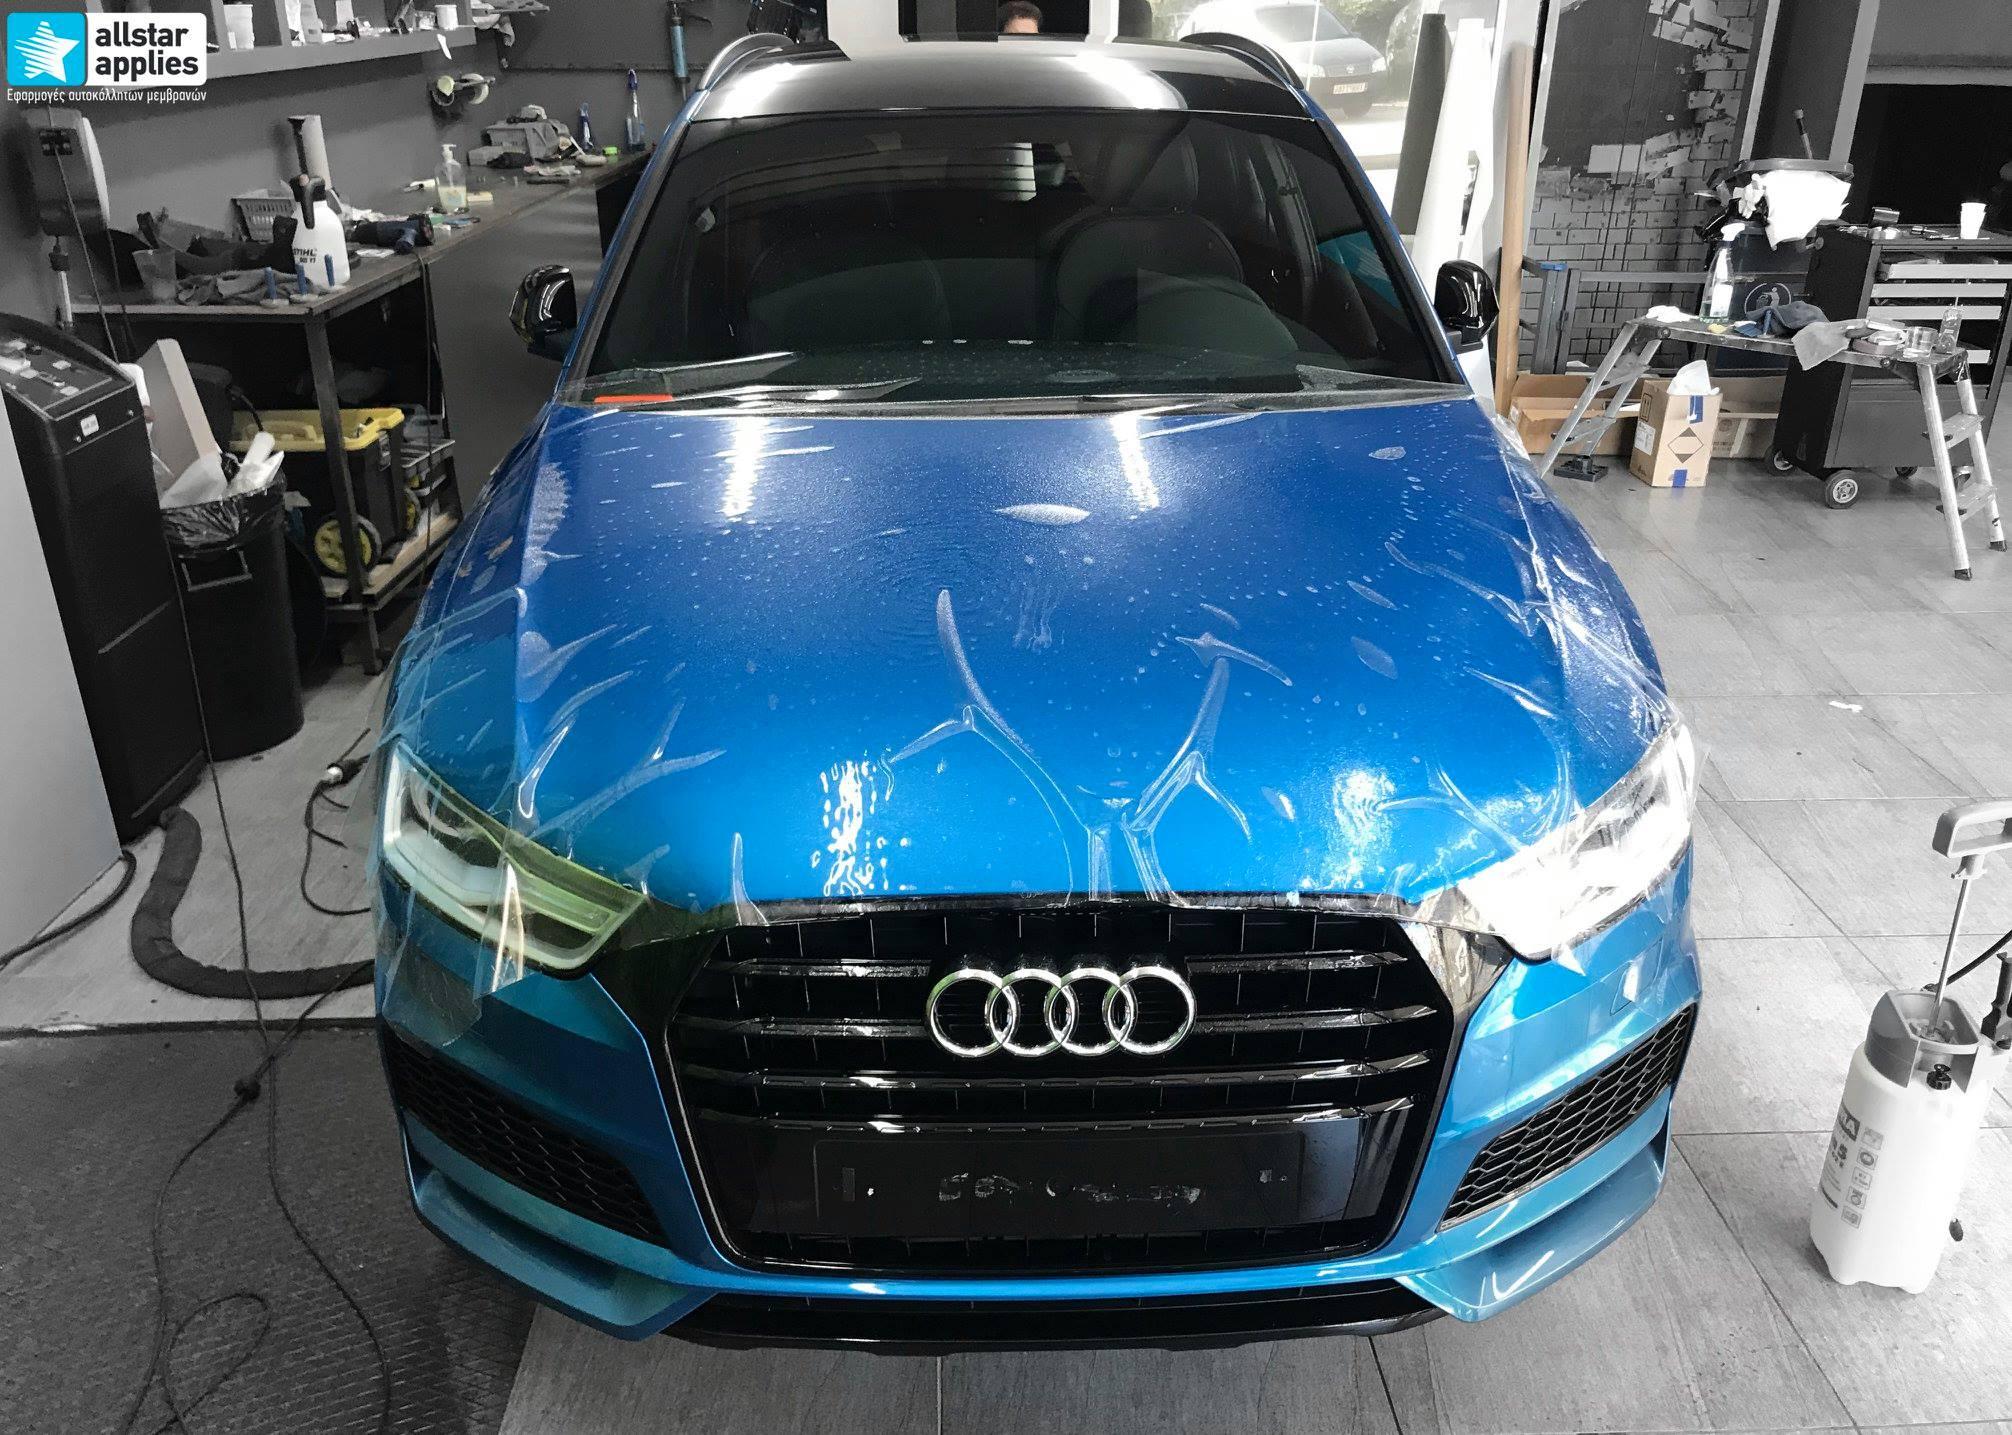 Audi Q3 – Μεμβράνες προστασίας χρώματος (Full Paint Protection Film) (12)